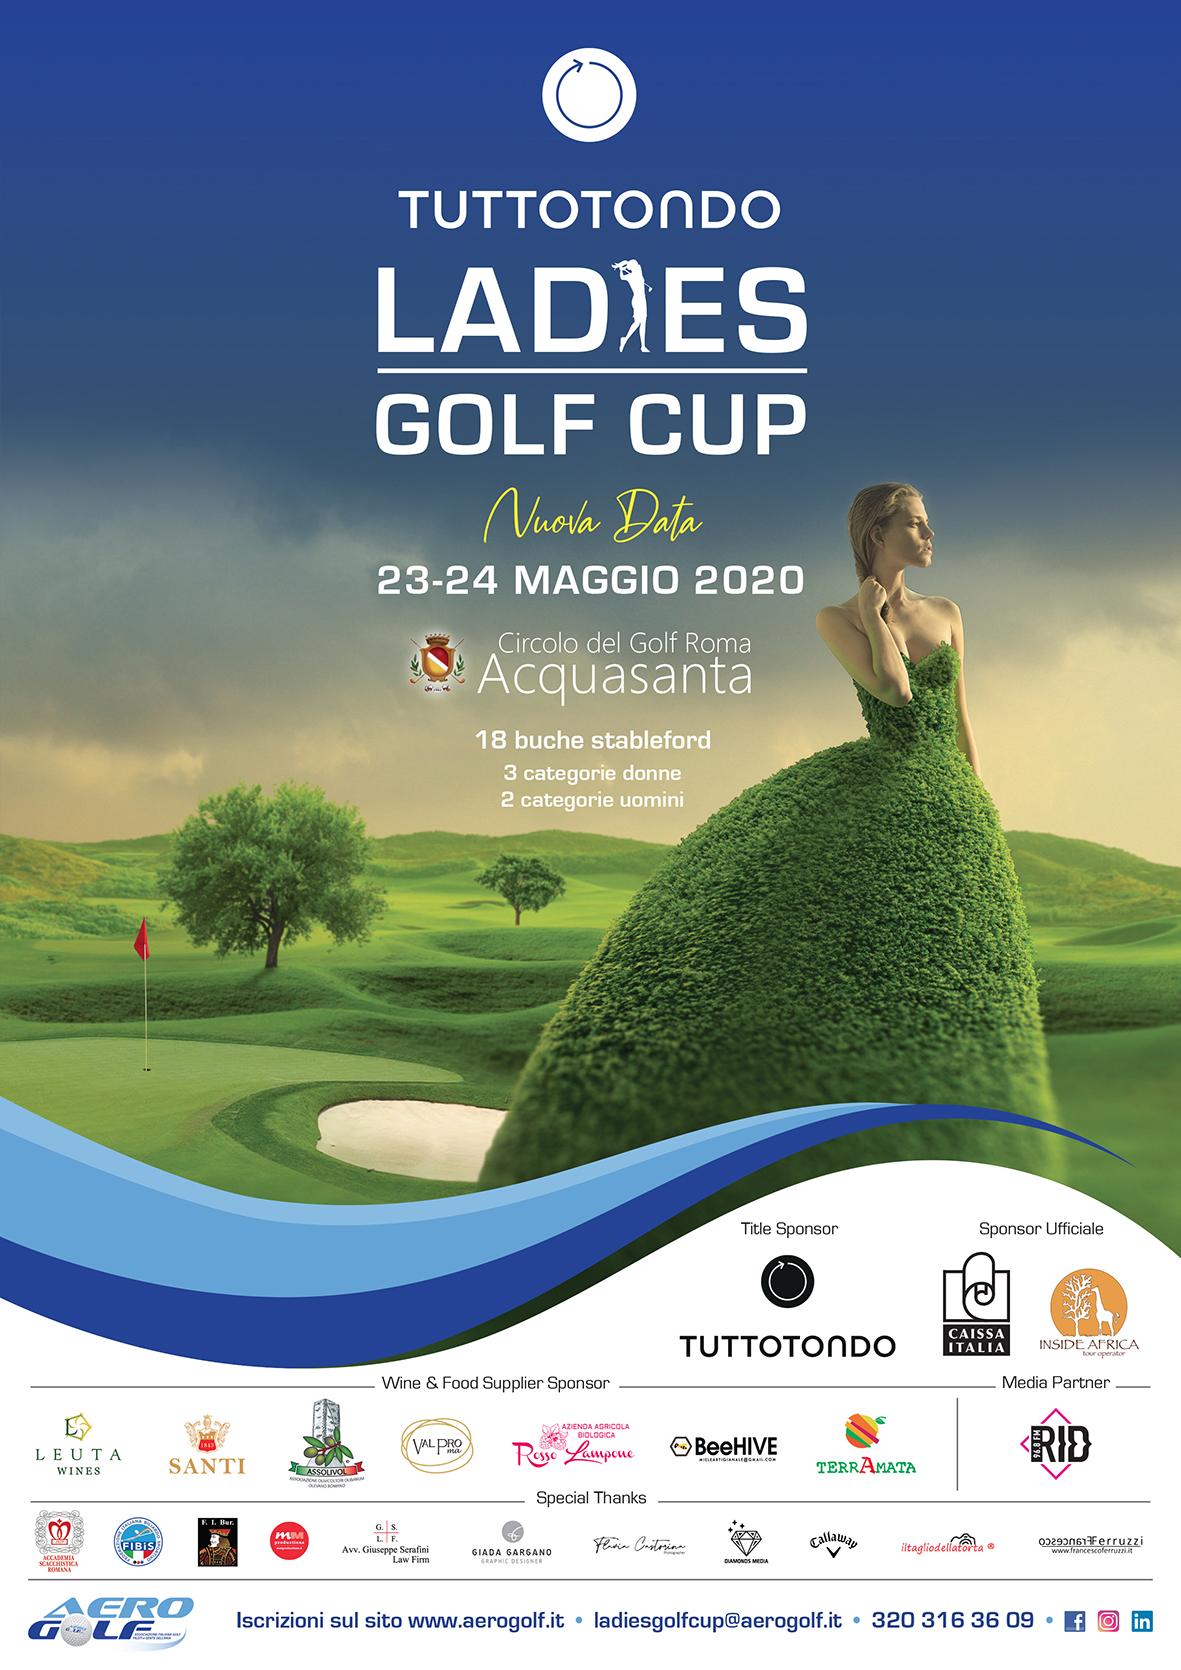 locandina_ladies-golf-cup_nuova-data